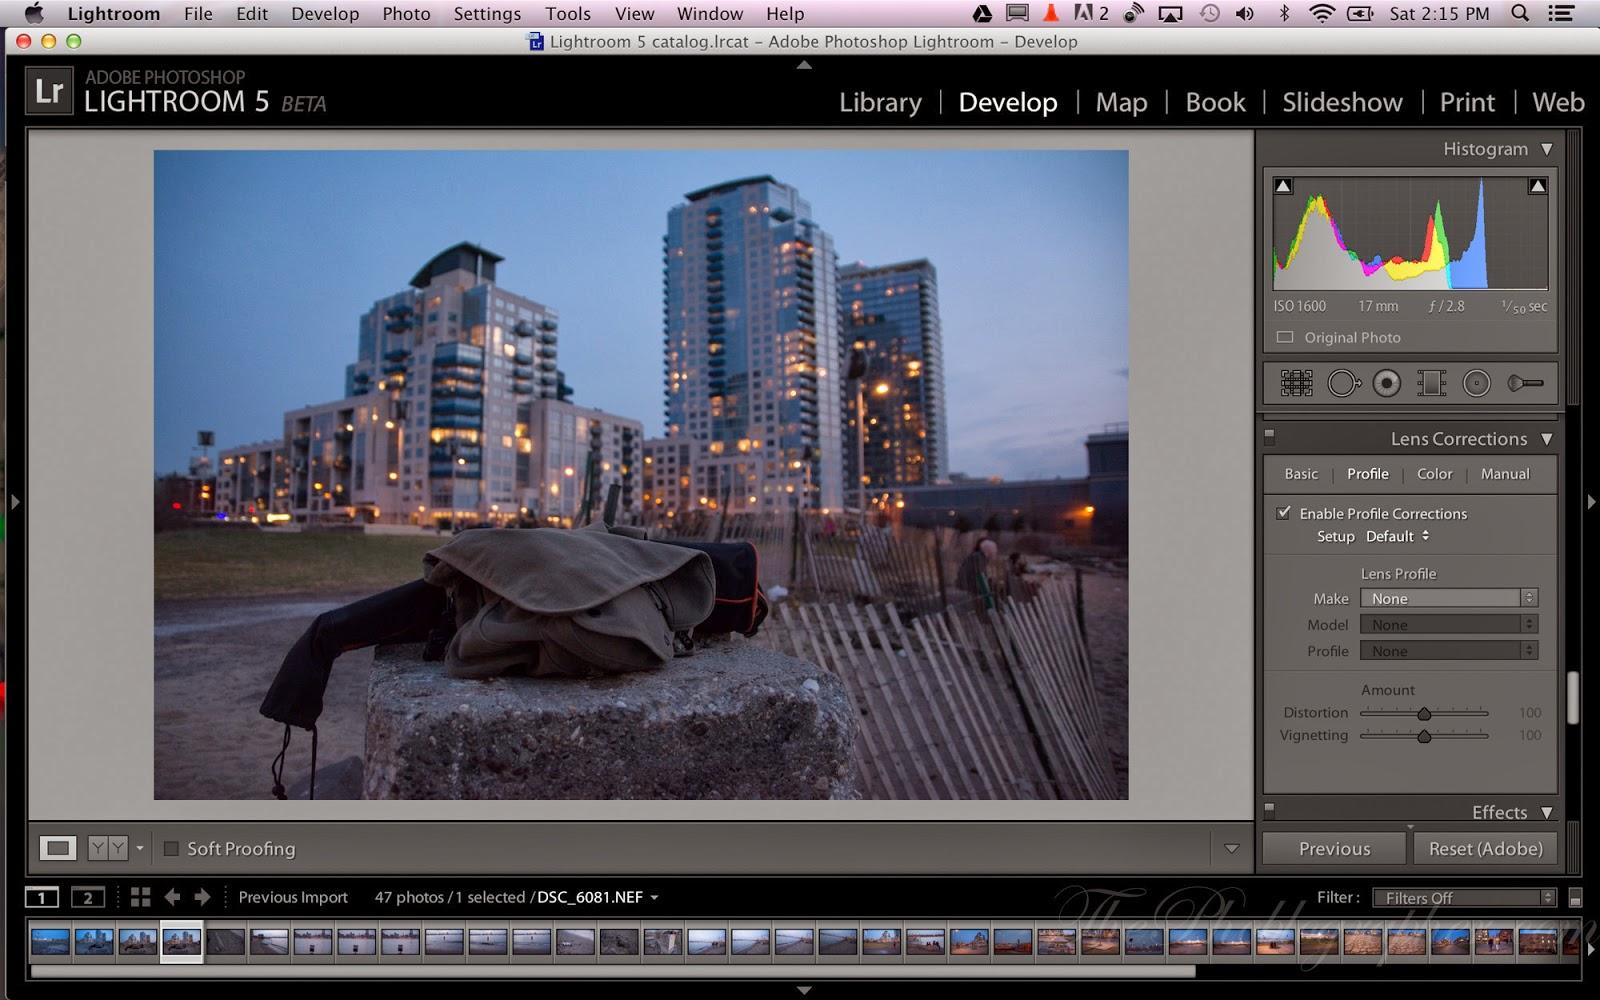 photoshop download free windows 7